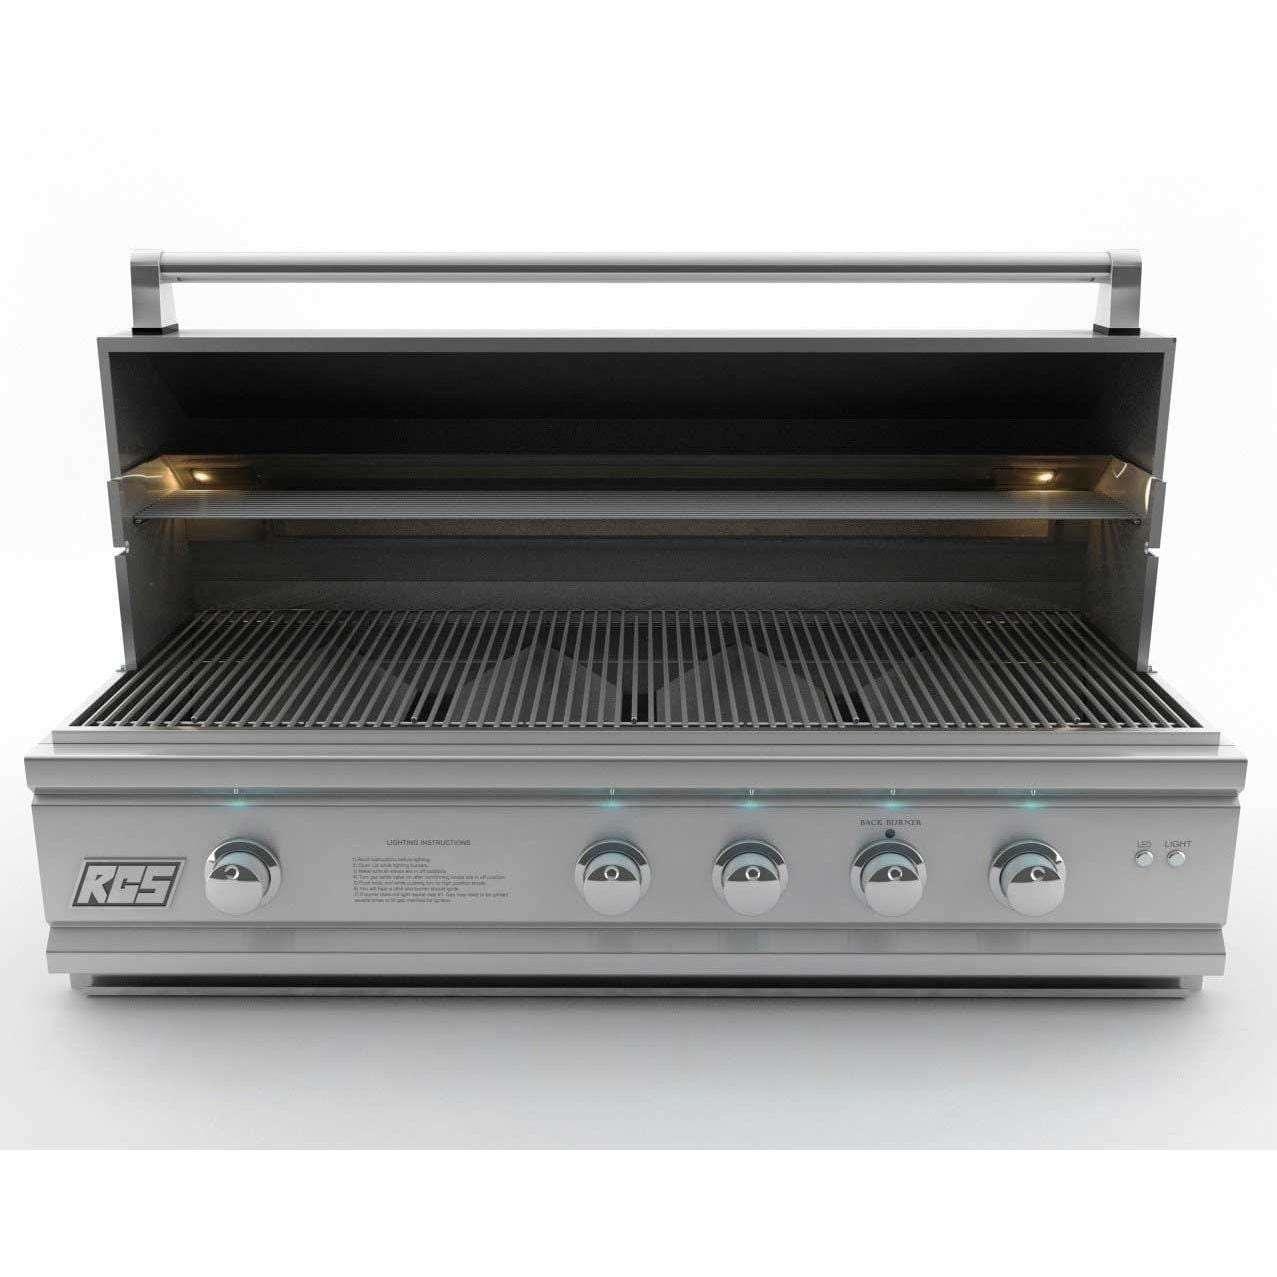 RCS Cutlass Pro 42-Inch Gas Grill